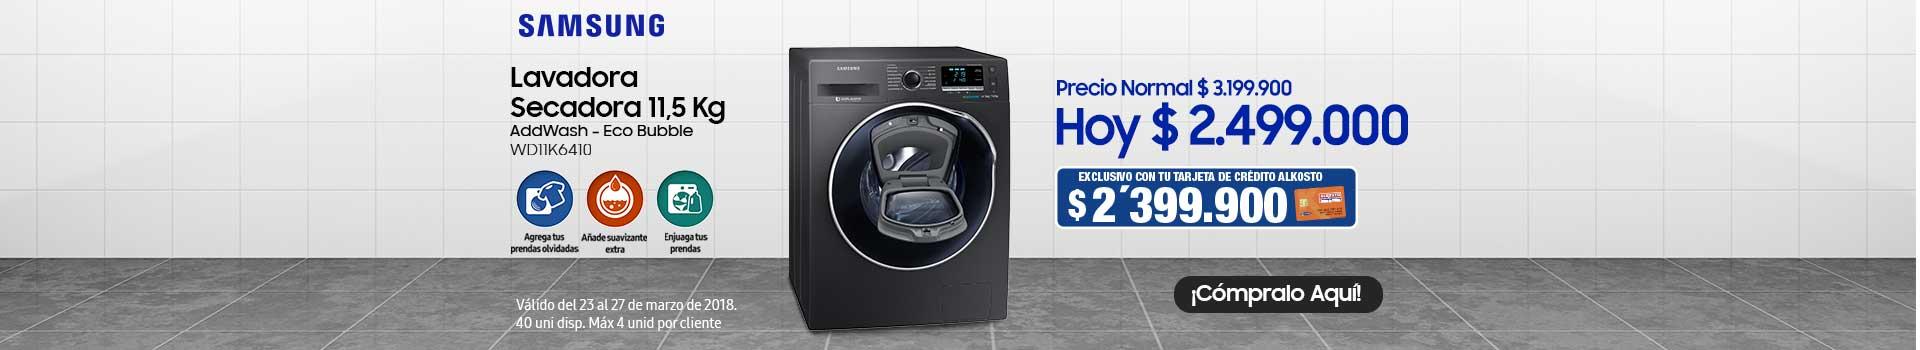 CAT-LAVSEC-AKyKT-1-LB-lavadora-secadora-samsung-cf-11-5kg-wd11k6410-prod-marzo24-27